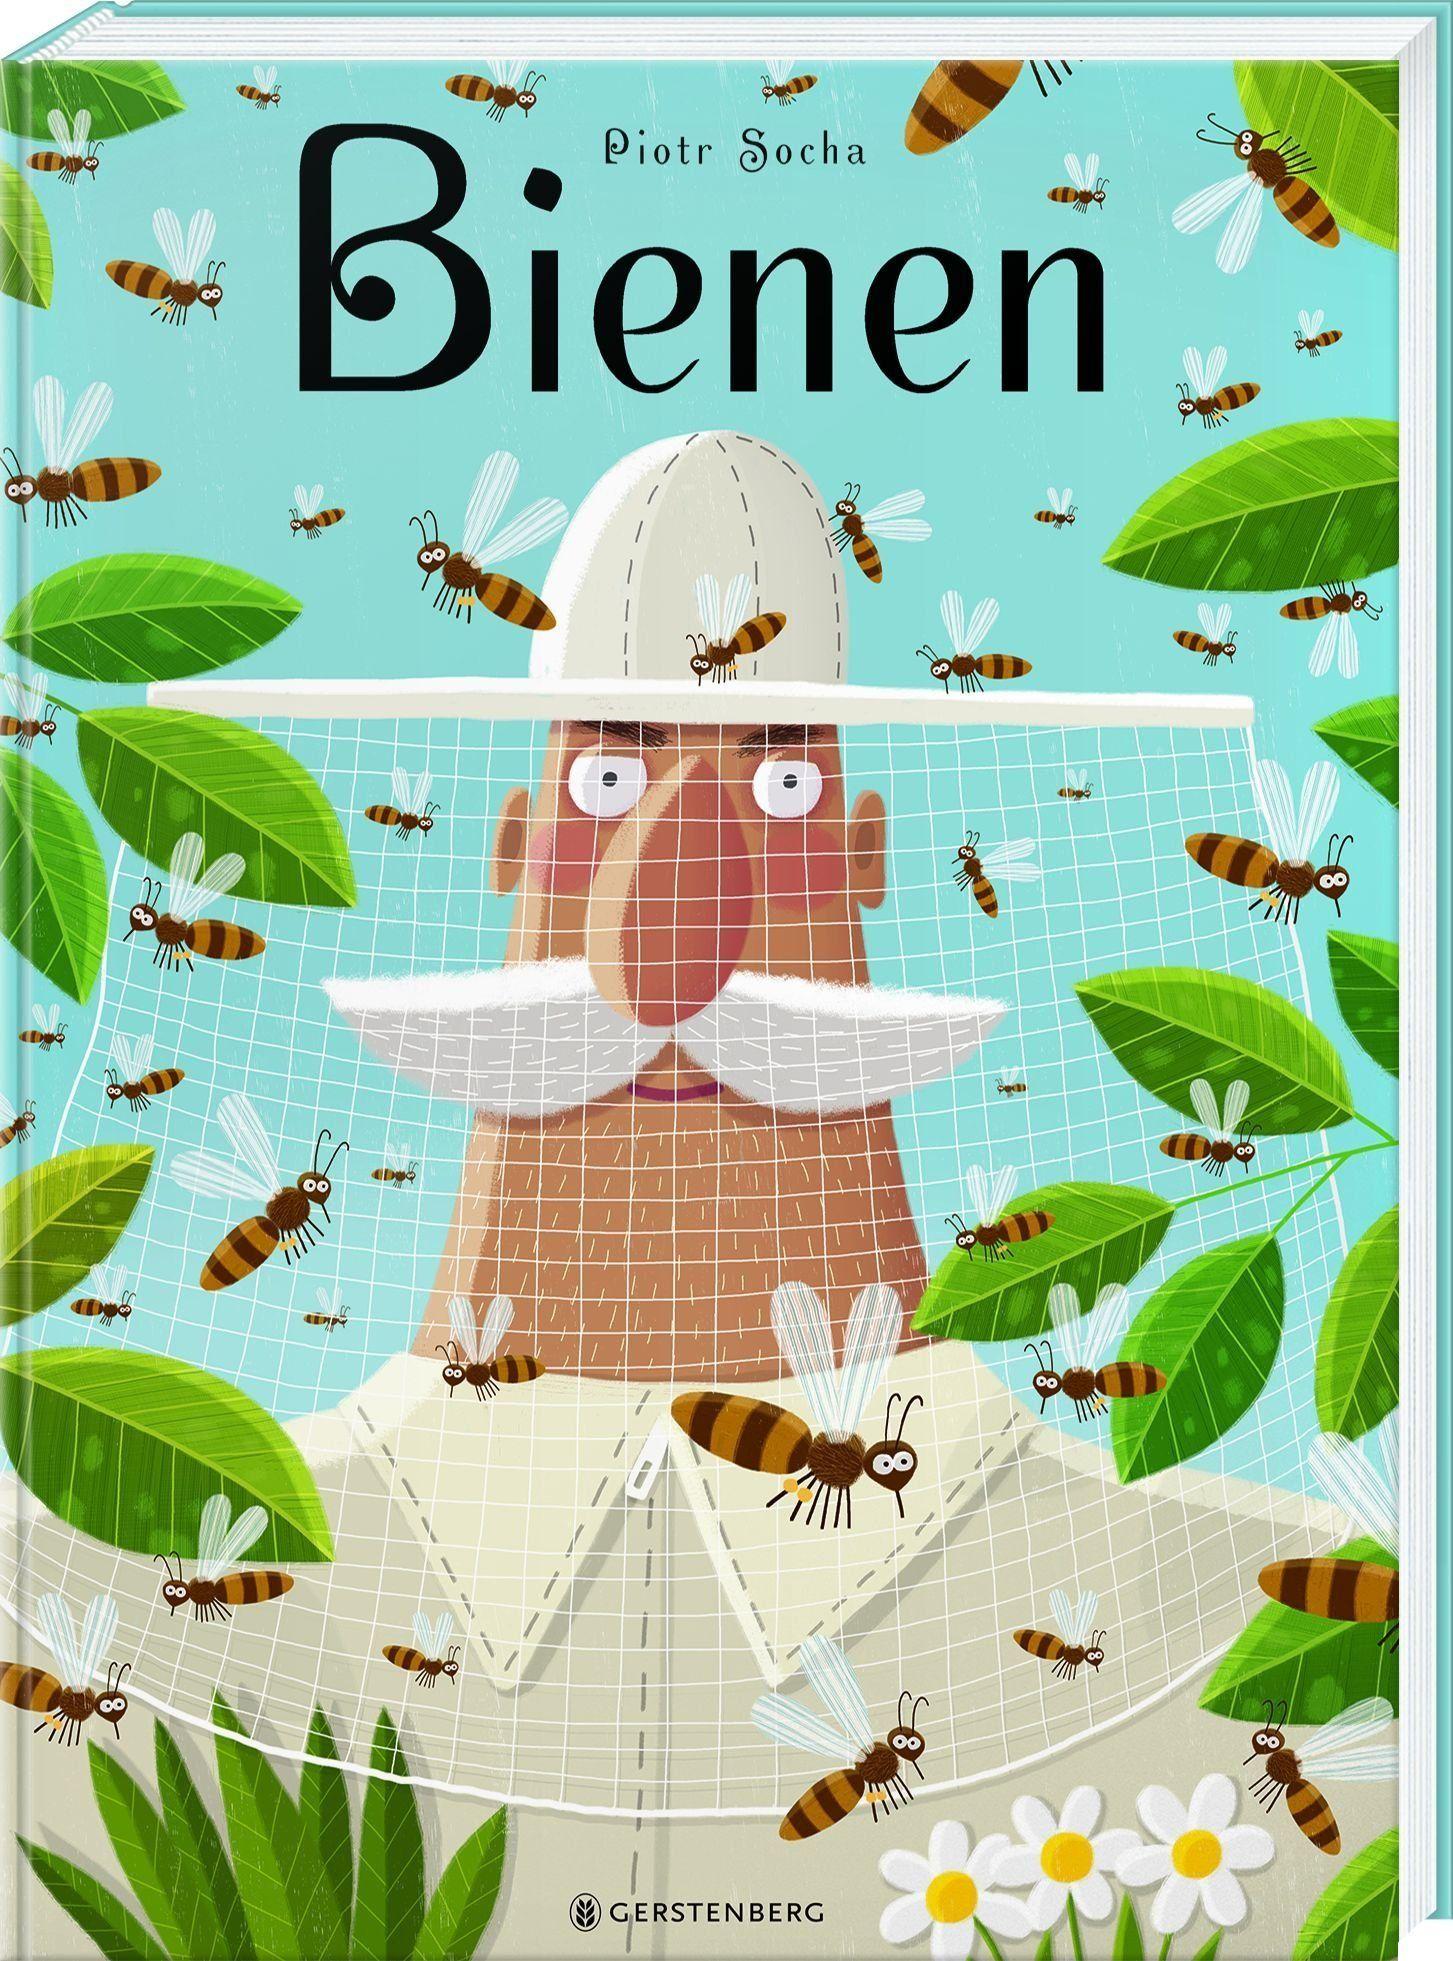 Bienen Amazon De Piotr Socha Thomas Weiler Bucher Flower Illustration Children Illustration Childrens Books Illustrations